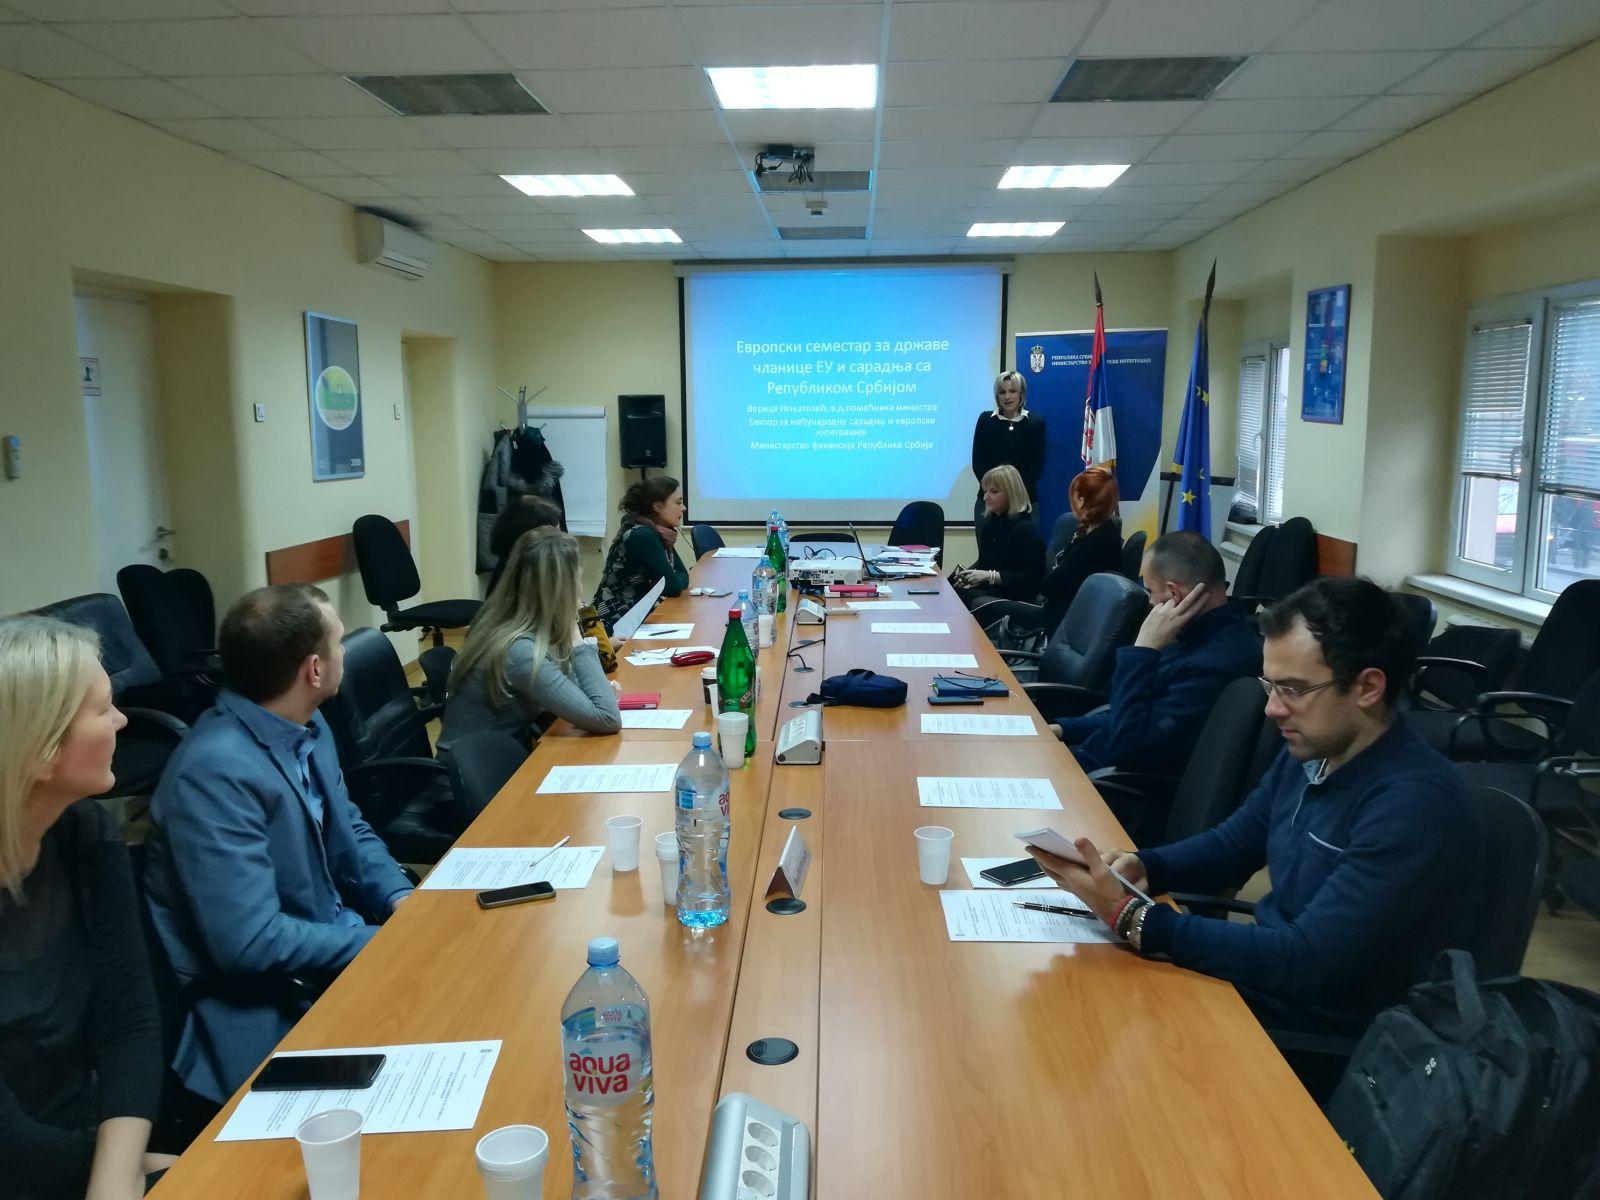 Otvoren seminar o evropskom semestru